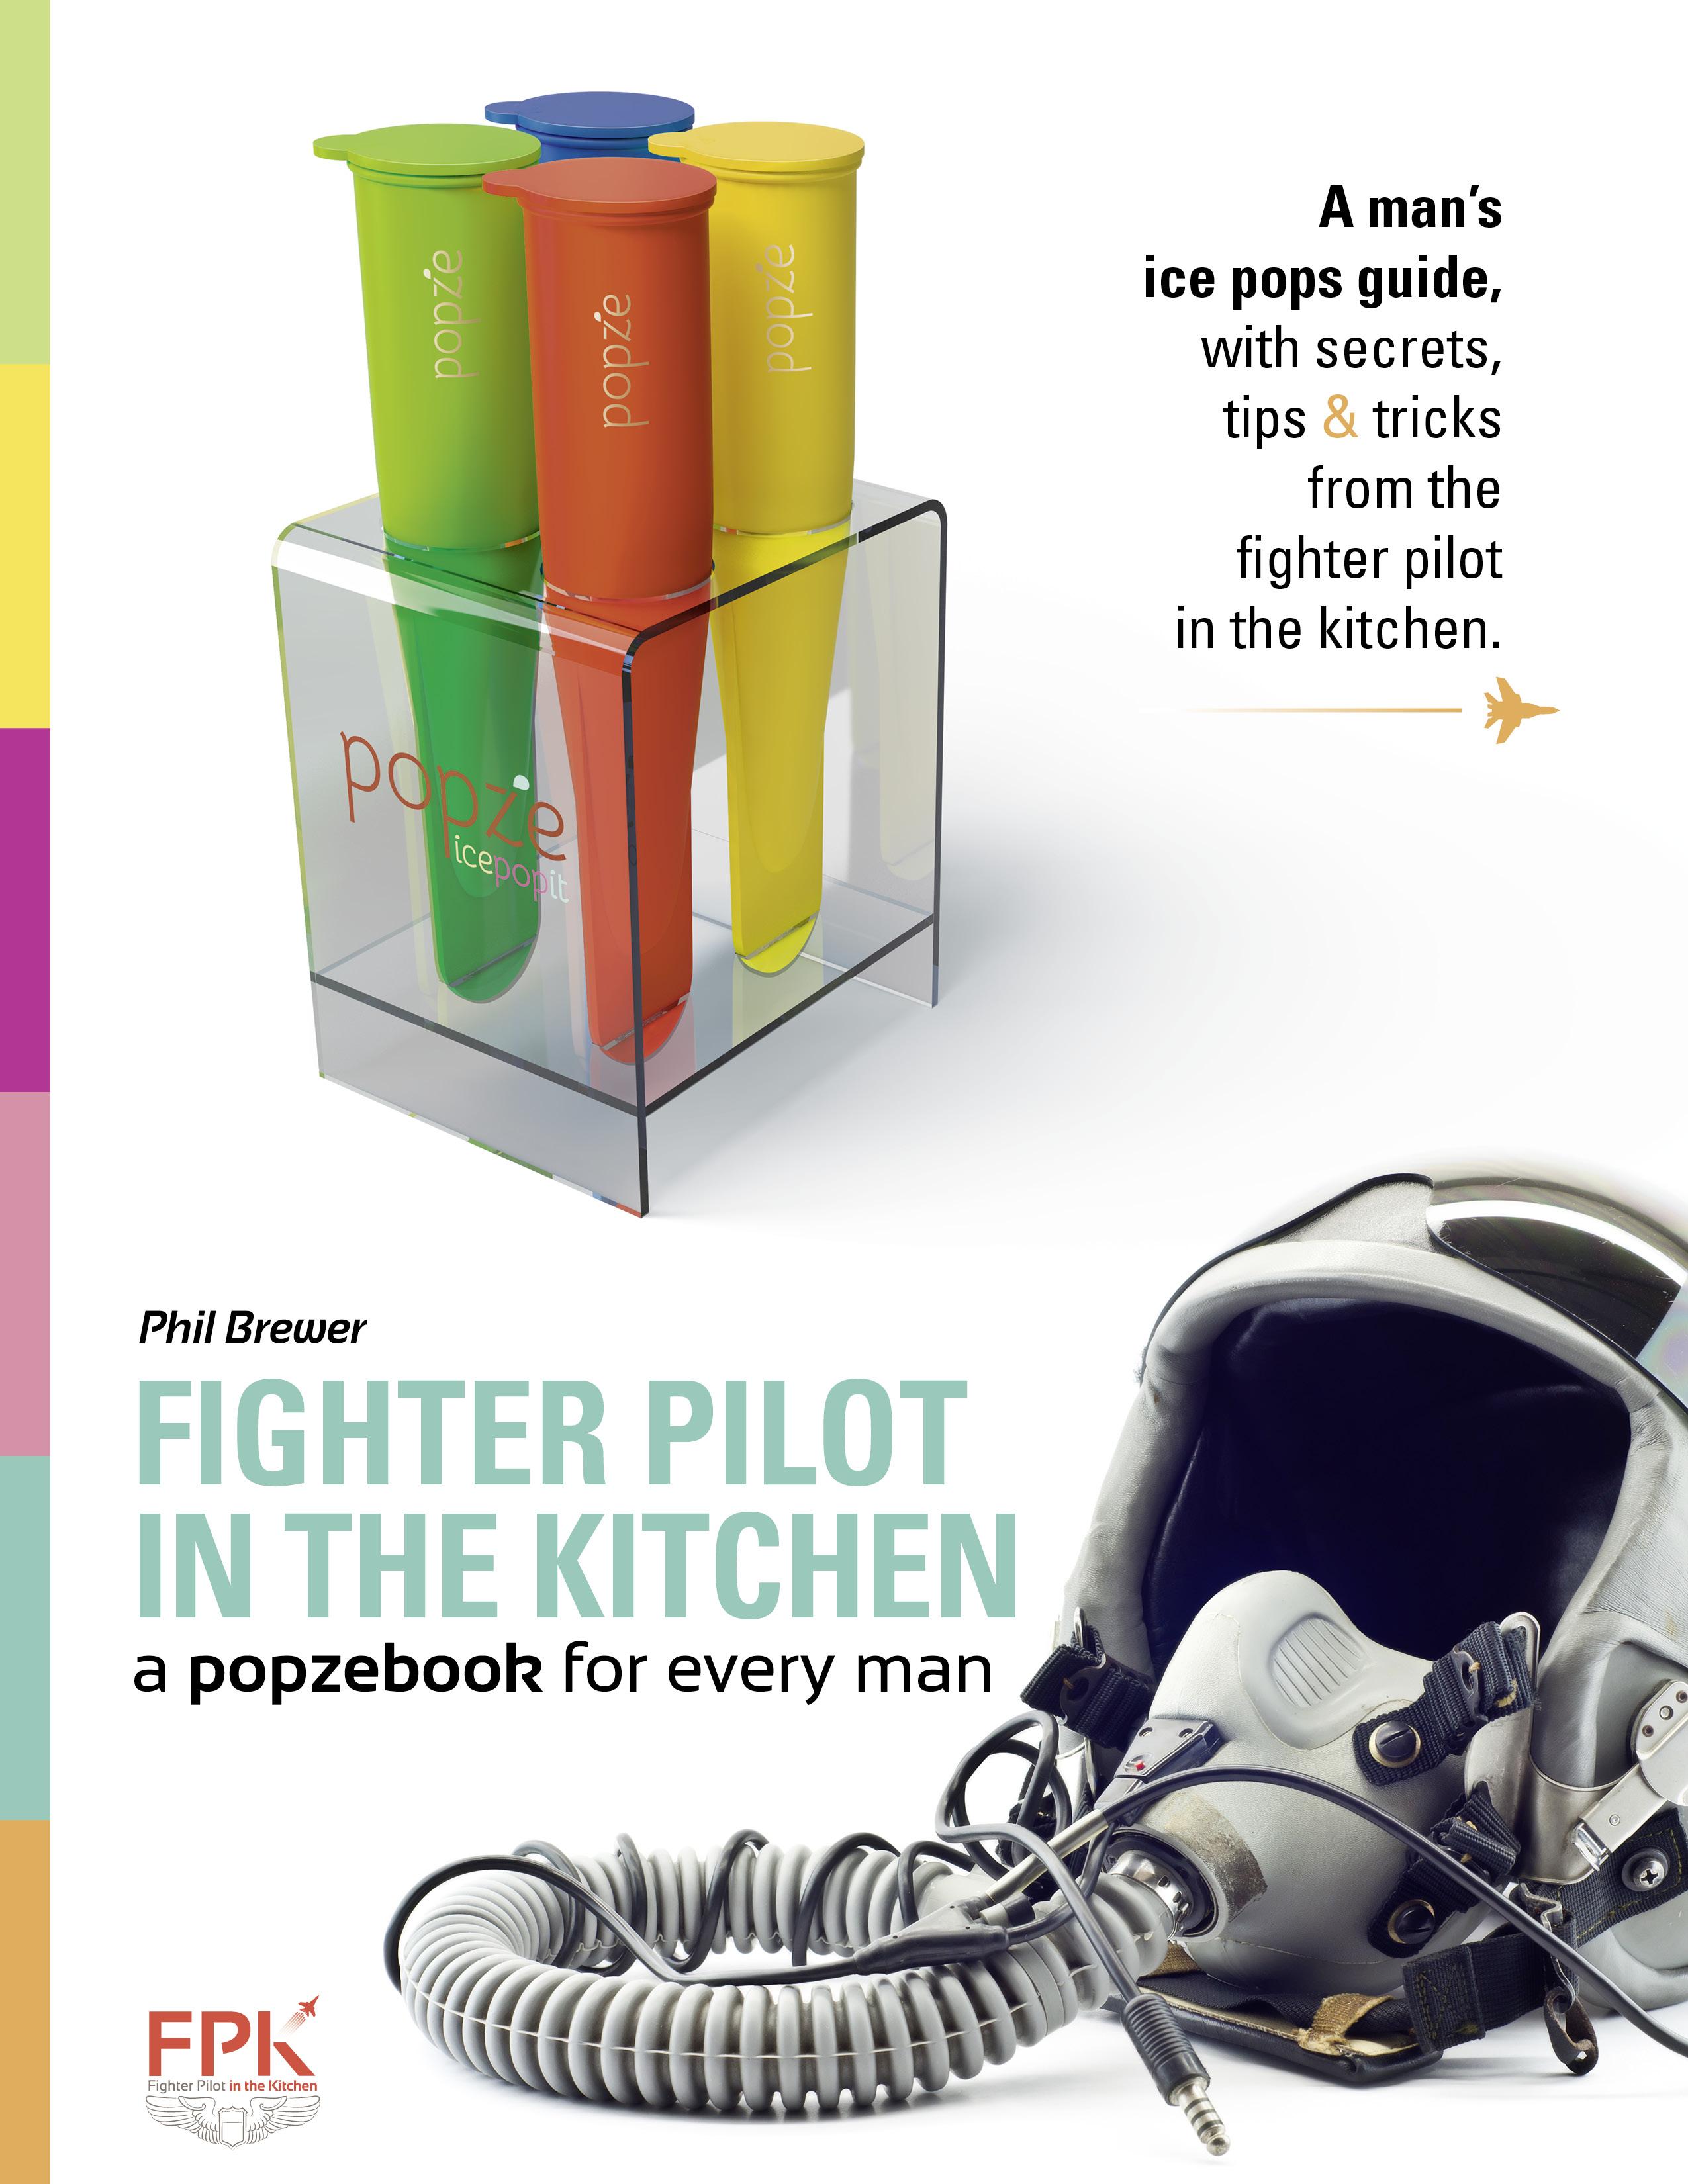 Popzebook - recipes extraordinaire